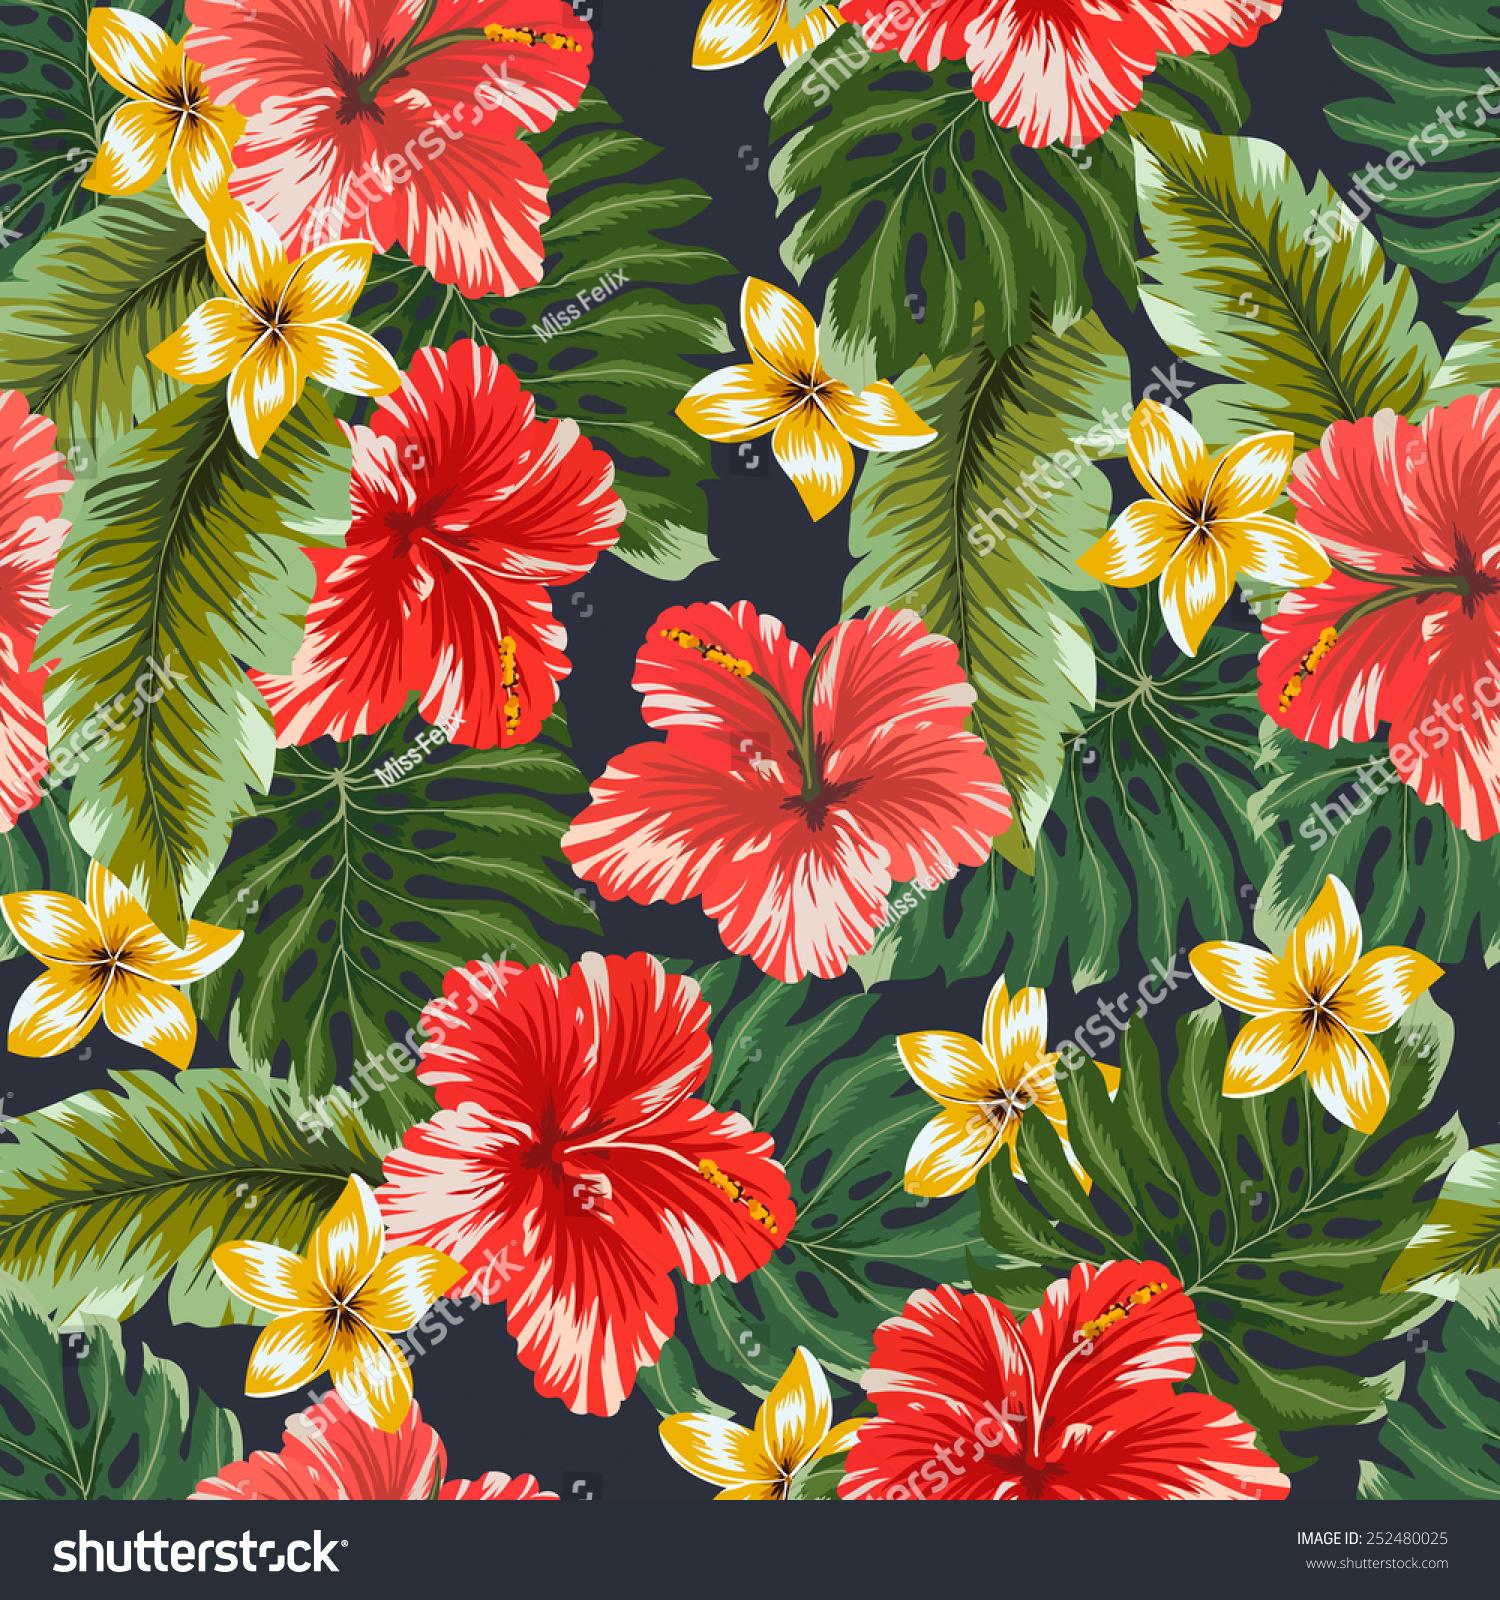 Hawaiian flower design background industrifo seamless pattern colorful hawaiian flowers on stock vector hawaiian flower design background izmirmasajfo